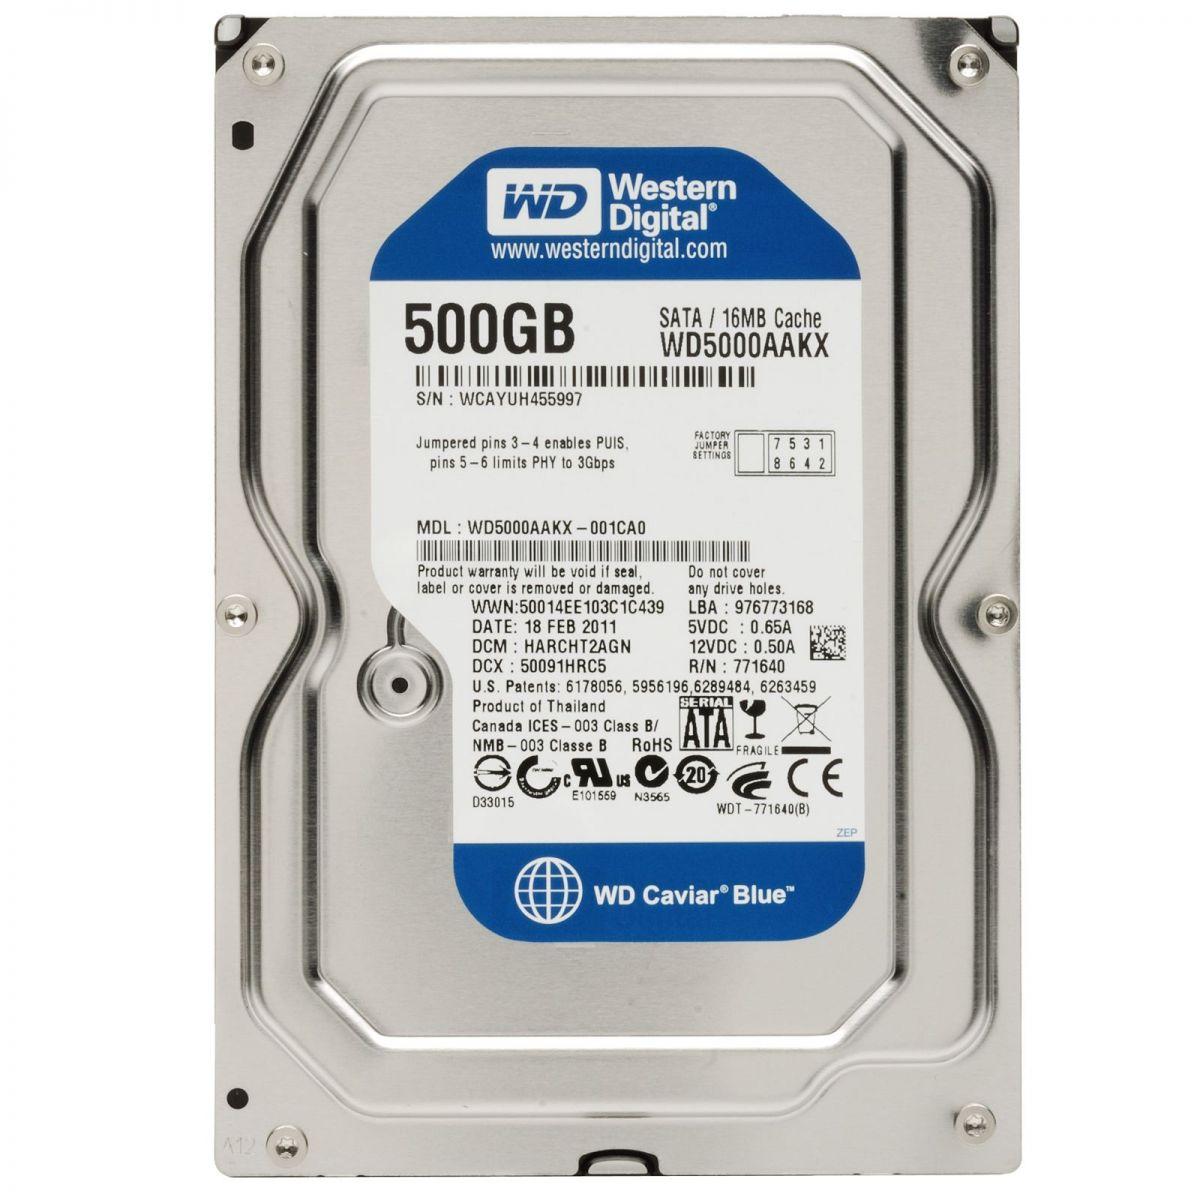 CPU Gamer TT N24  Amd 4Ghz Turbo + 8GB Memória + 500GB HD + R7 350 2GB